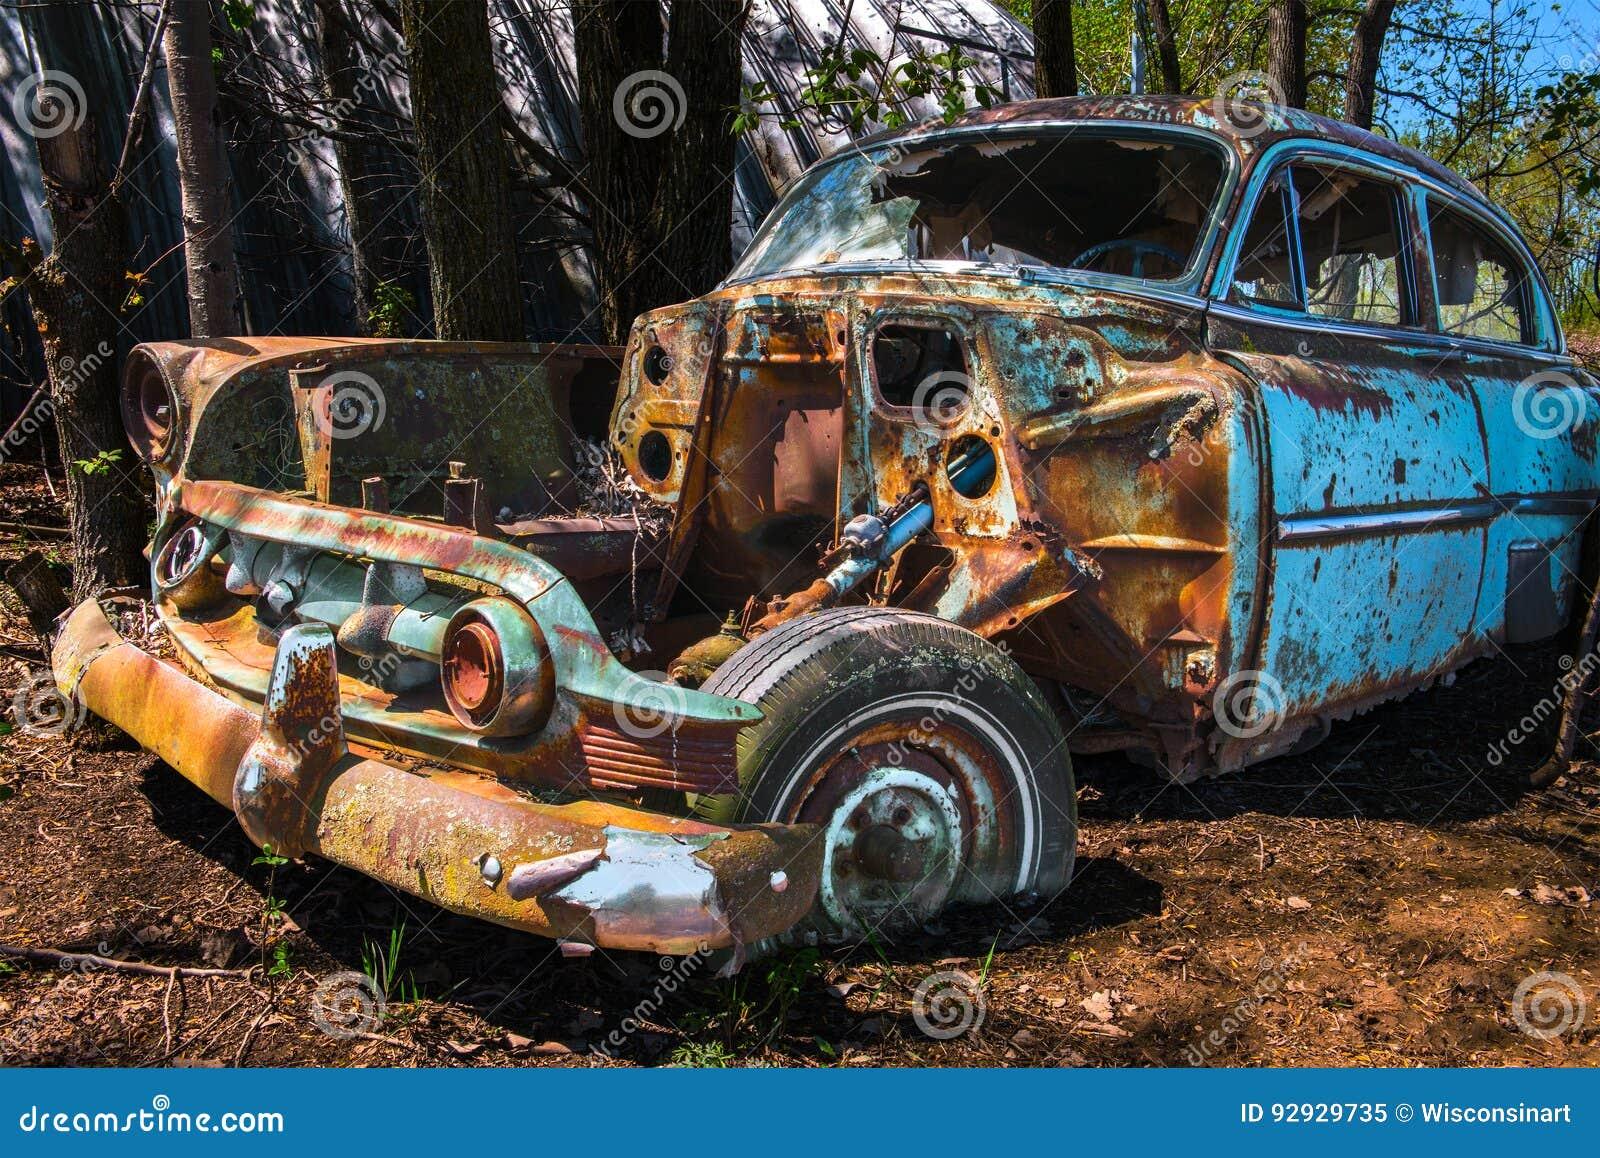 Old Classic Car, Junk Yard stock image. Image of retro - 92929735